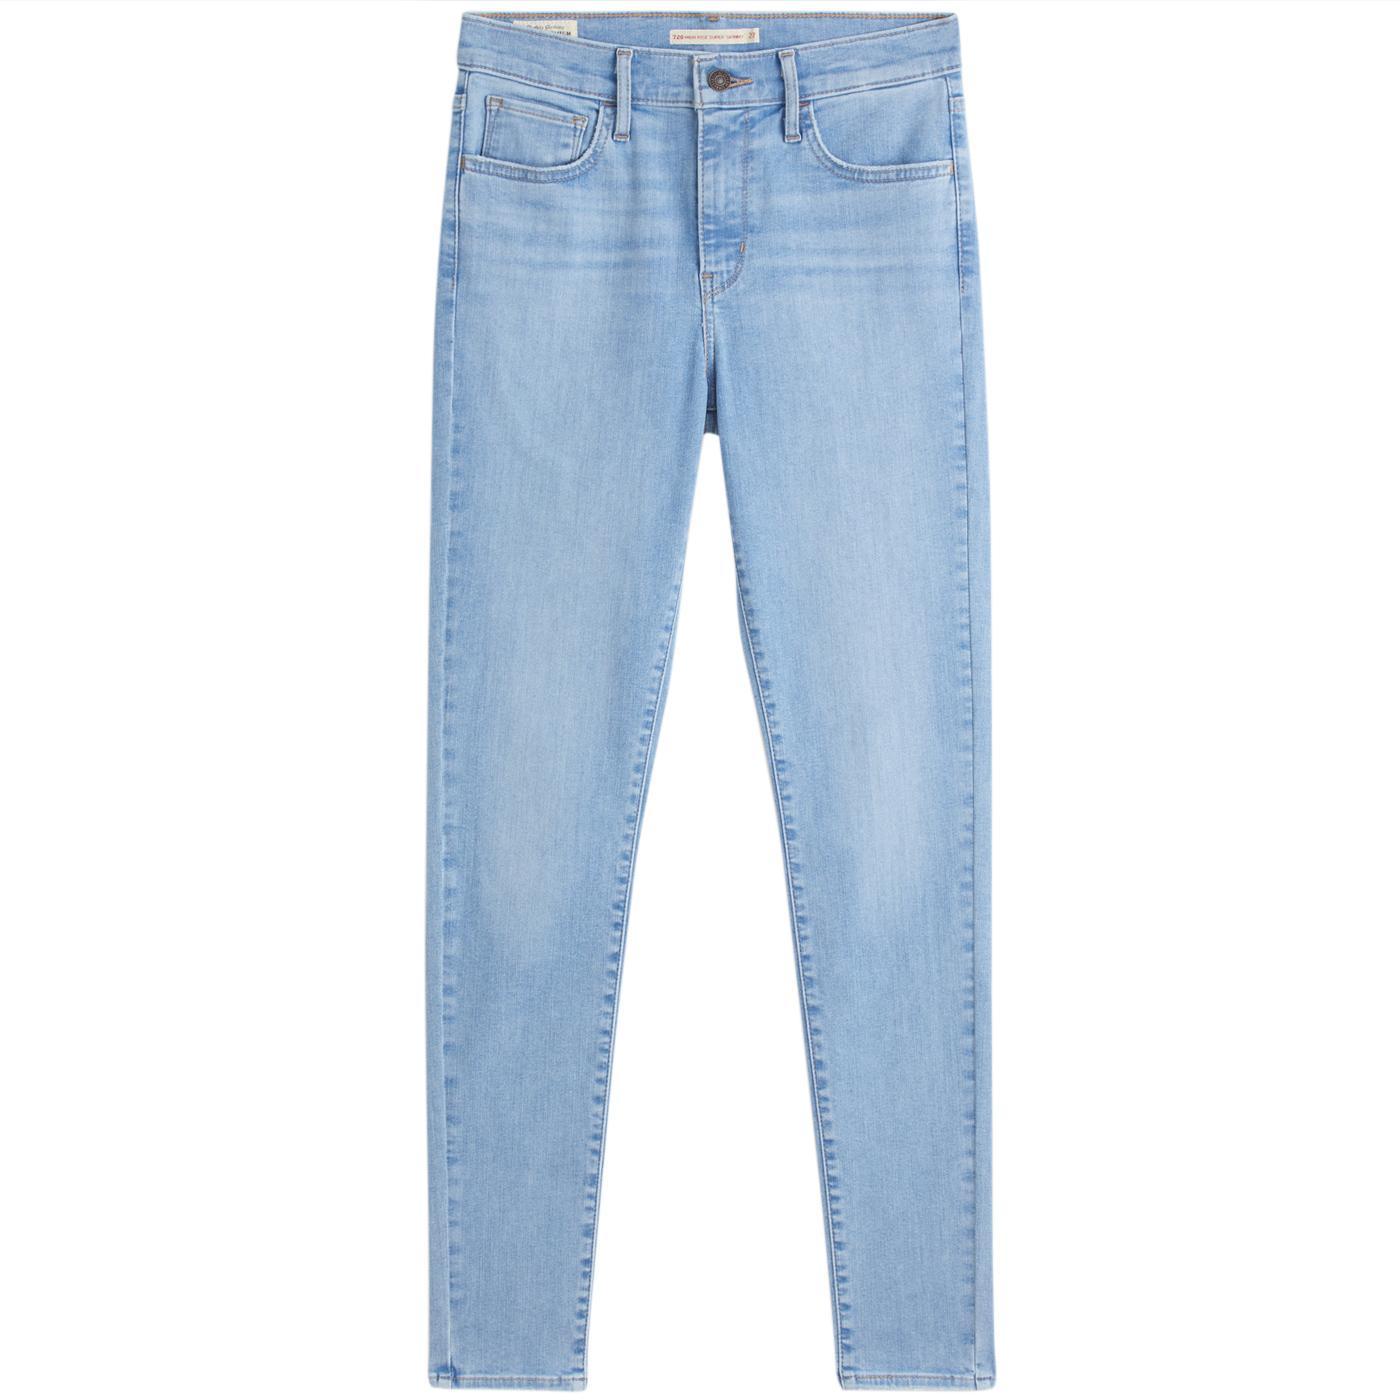 LEVI'S 720 High-Rise Super Skinny Jeans (Eclipse)